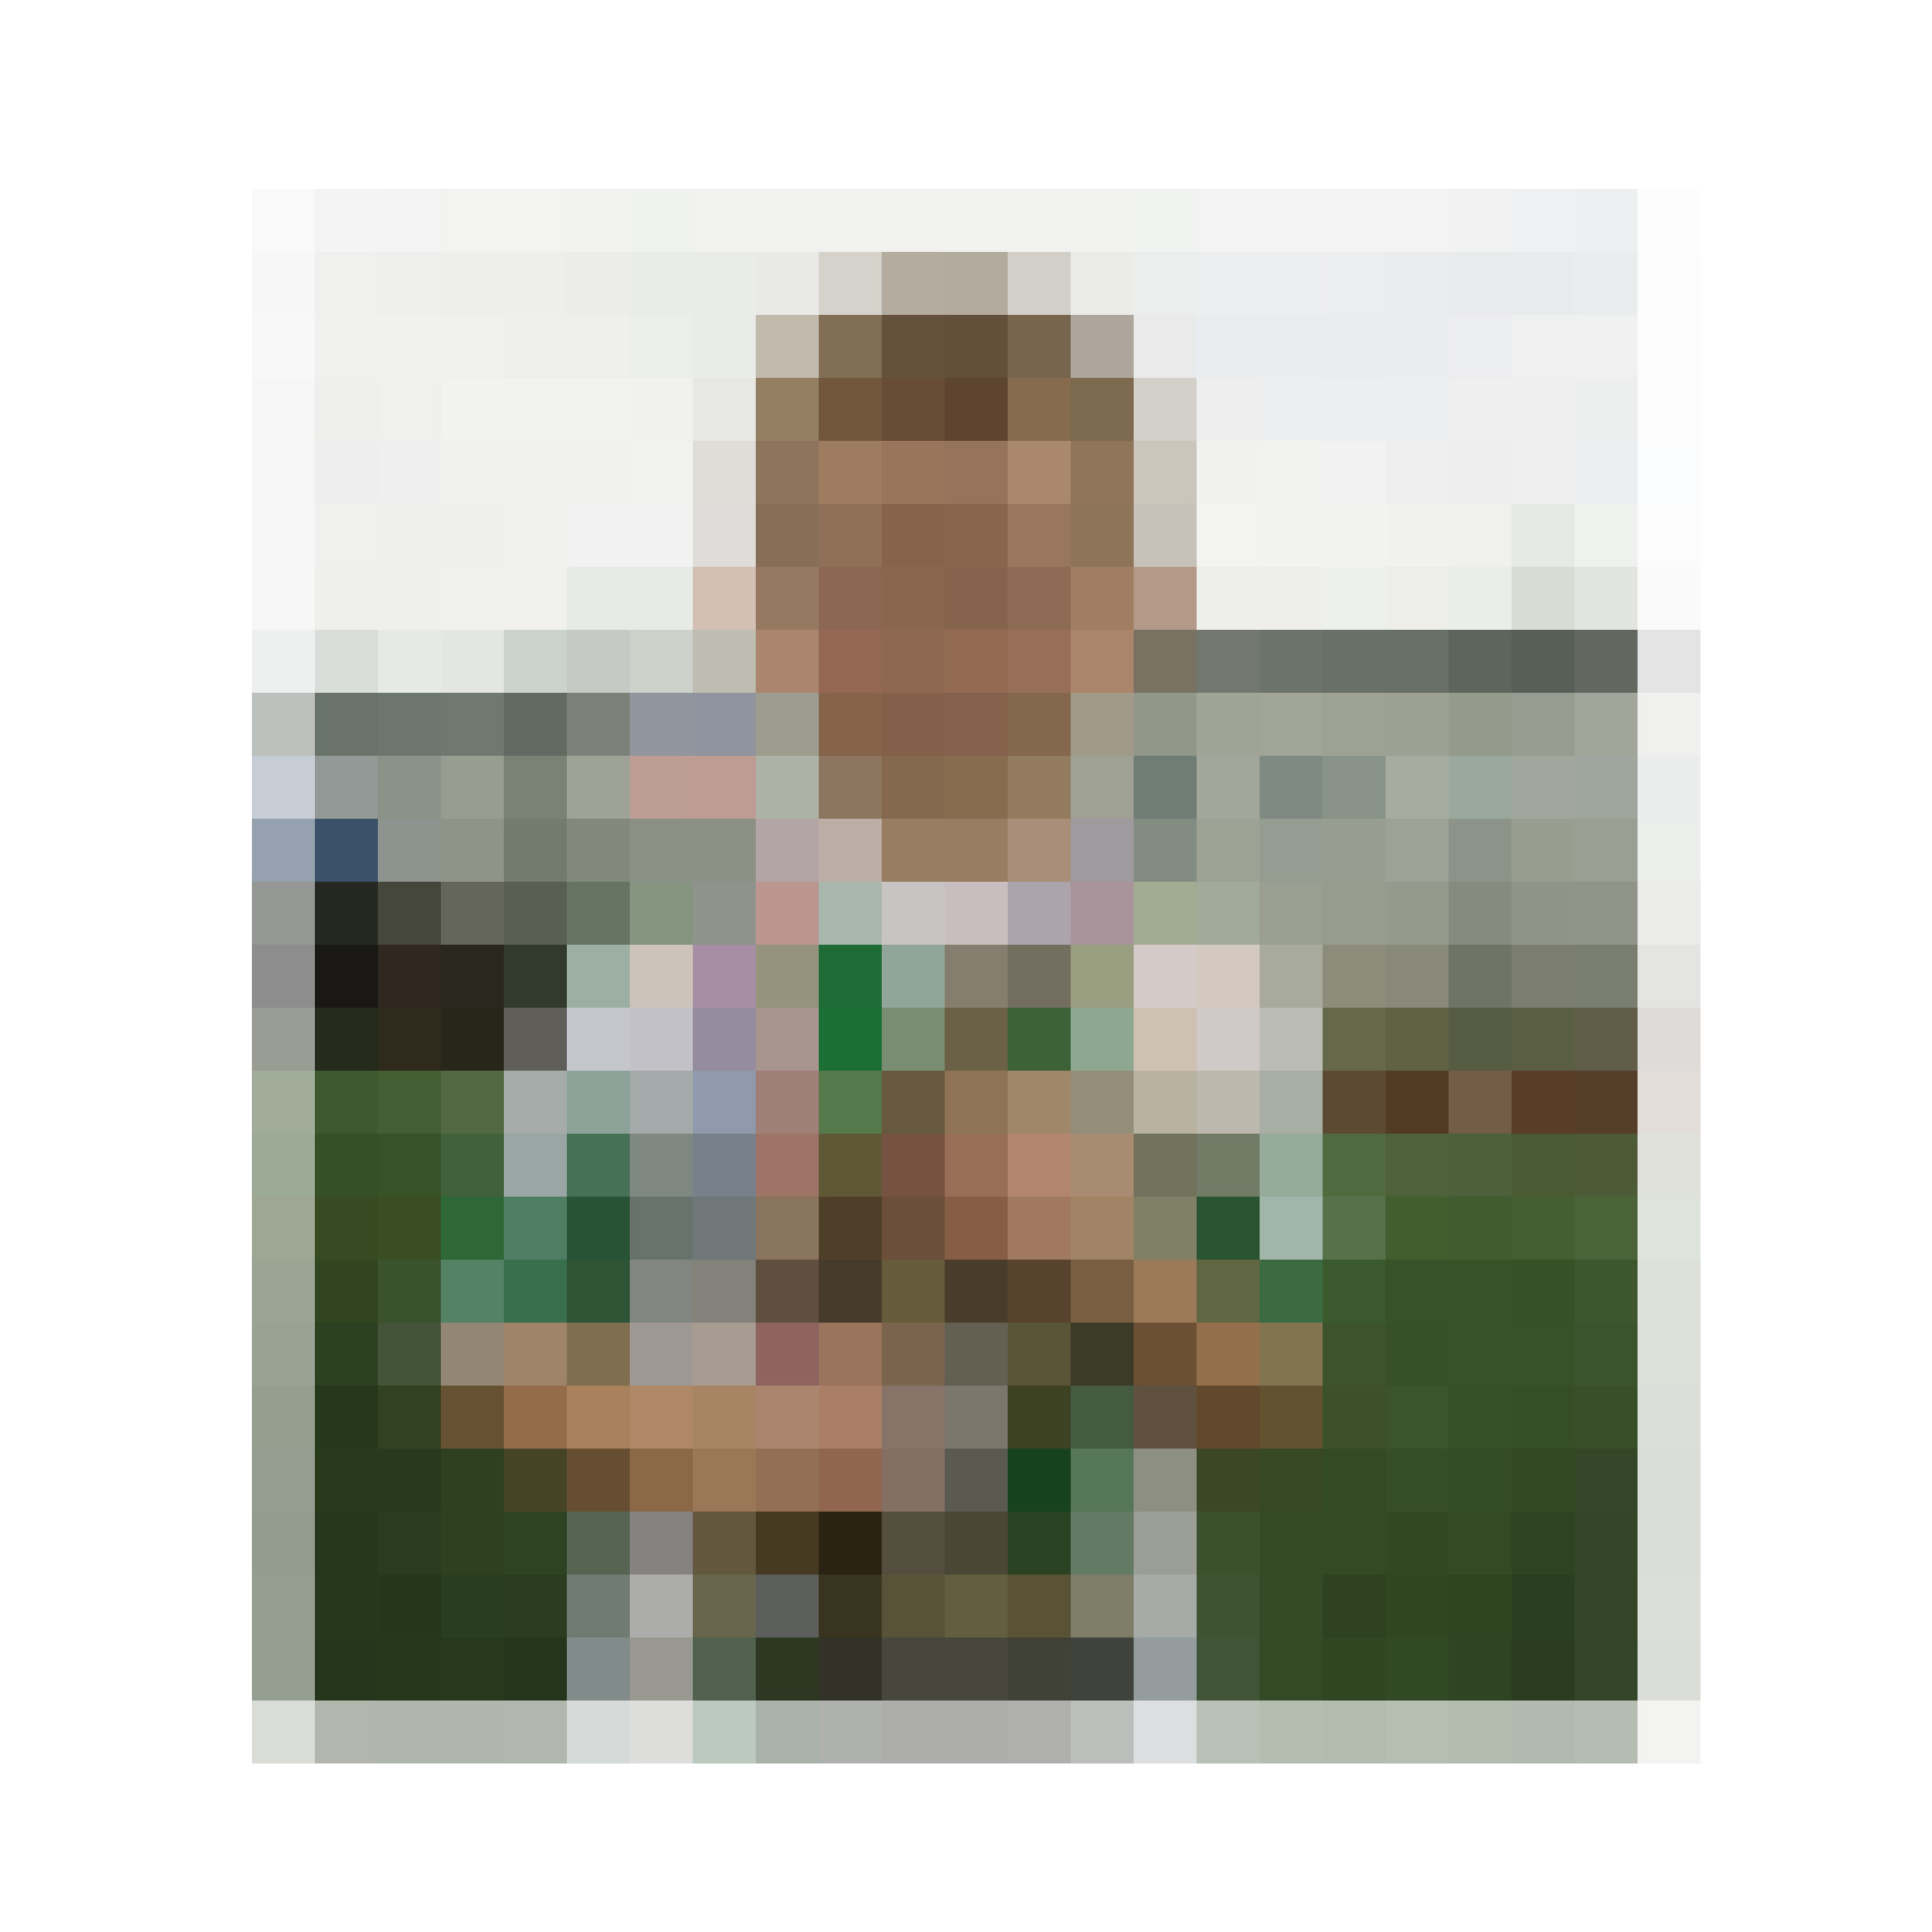 eoin football2.jpg